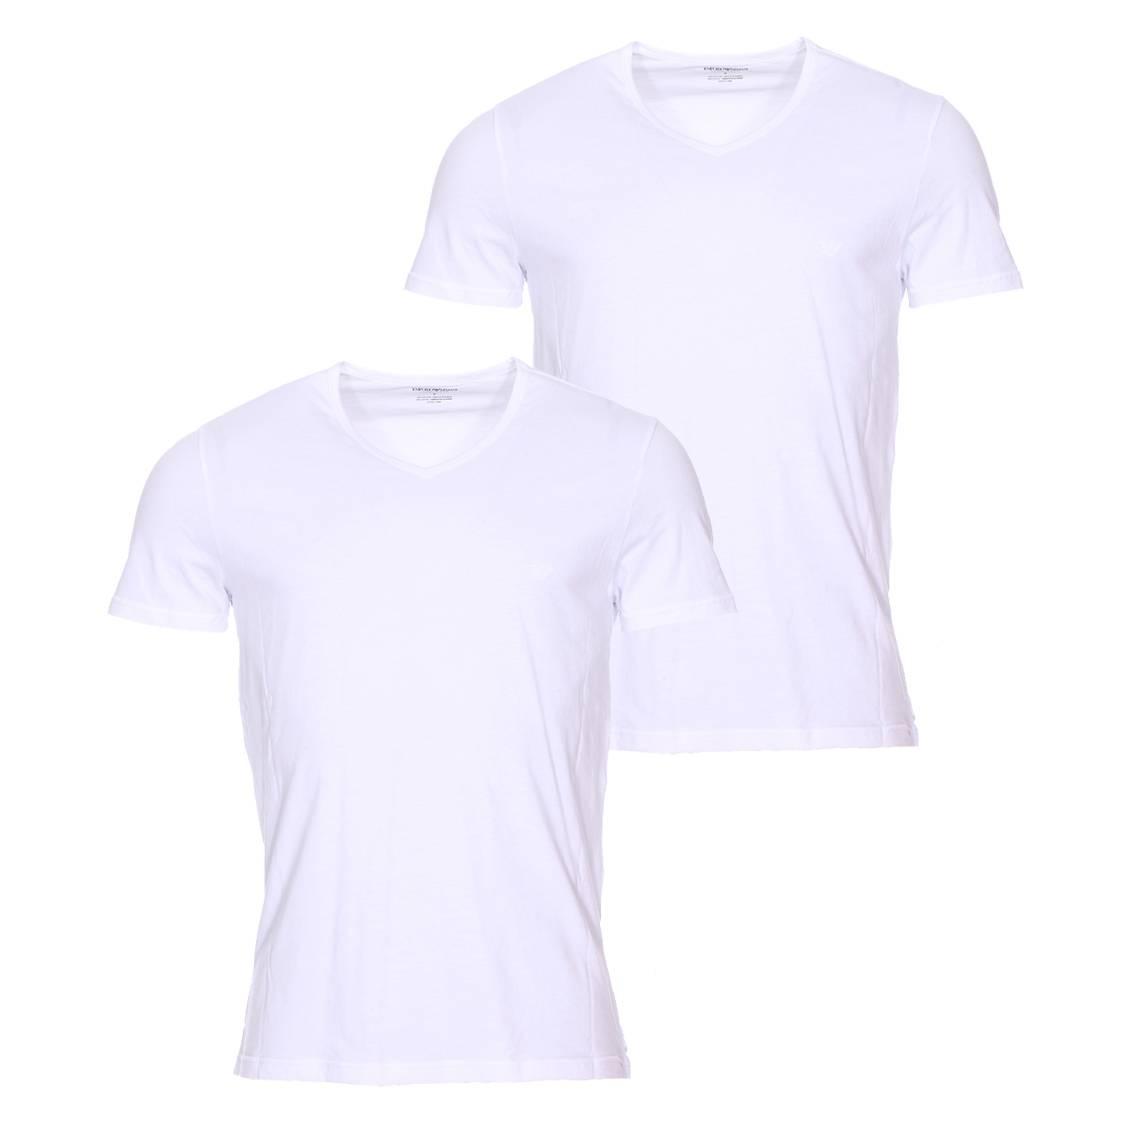 Lot de 2 tee-shirts col v  en coton blanc floqué en blanc